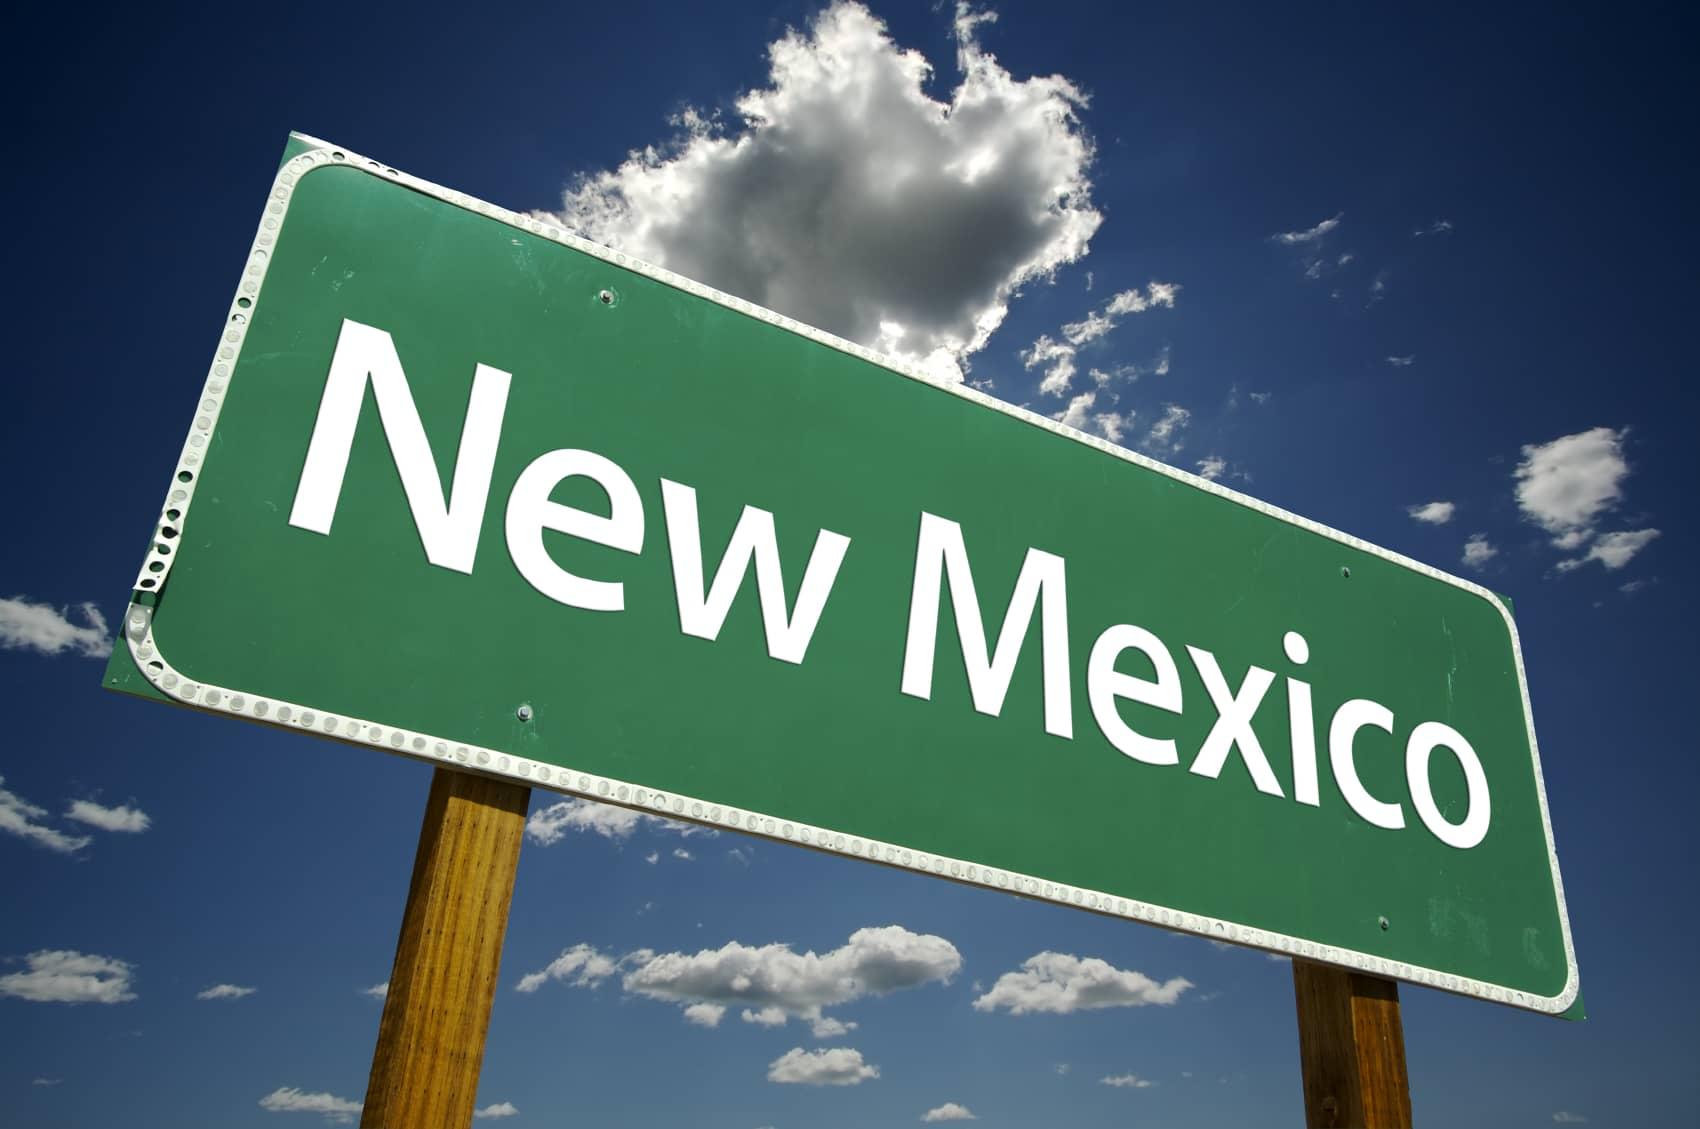 iStock_000007599093_Medium Duke Energy Renewables Enters N.M. With 25 MW Project